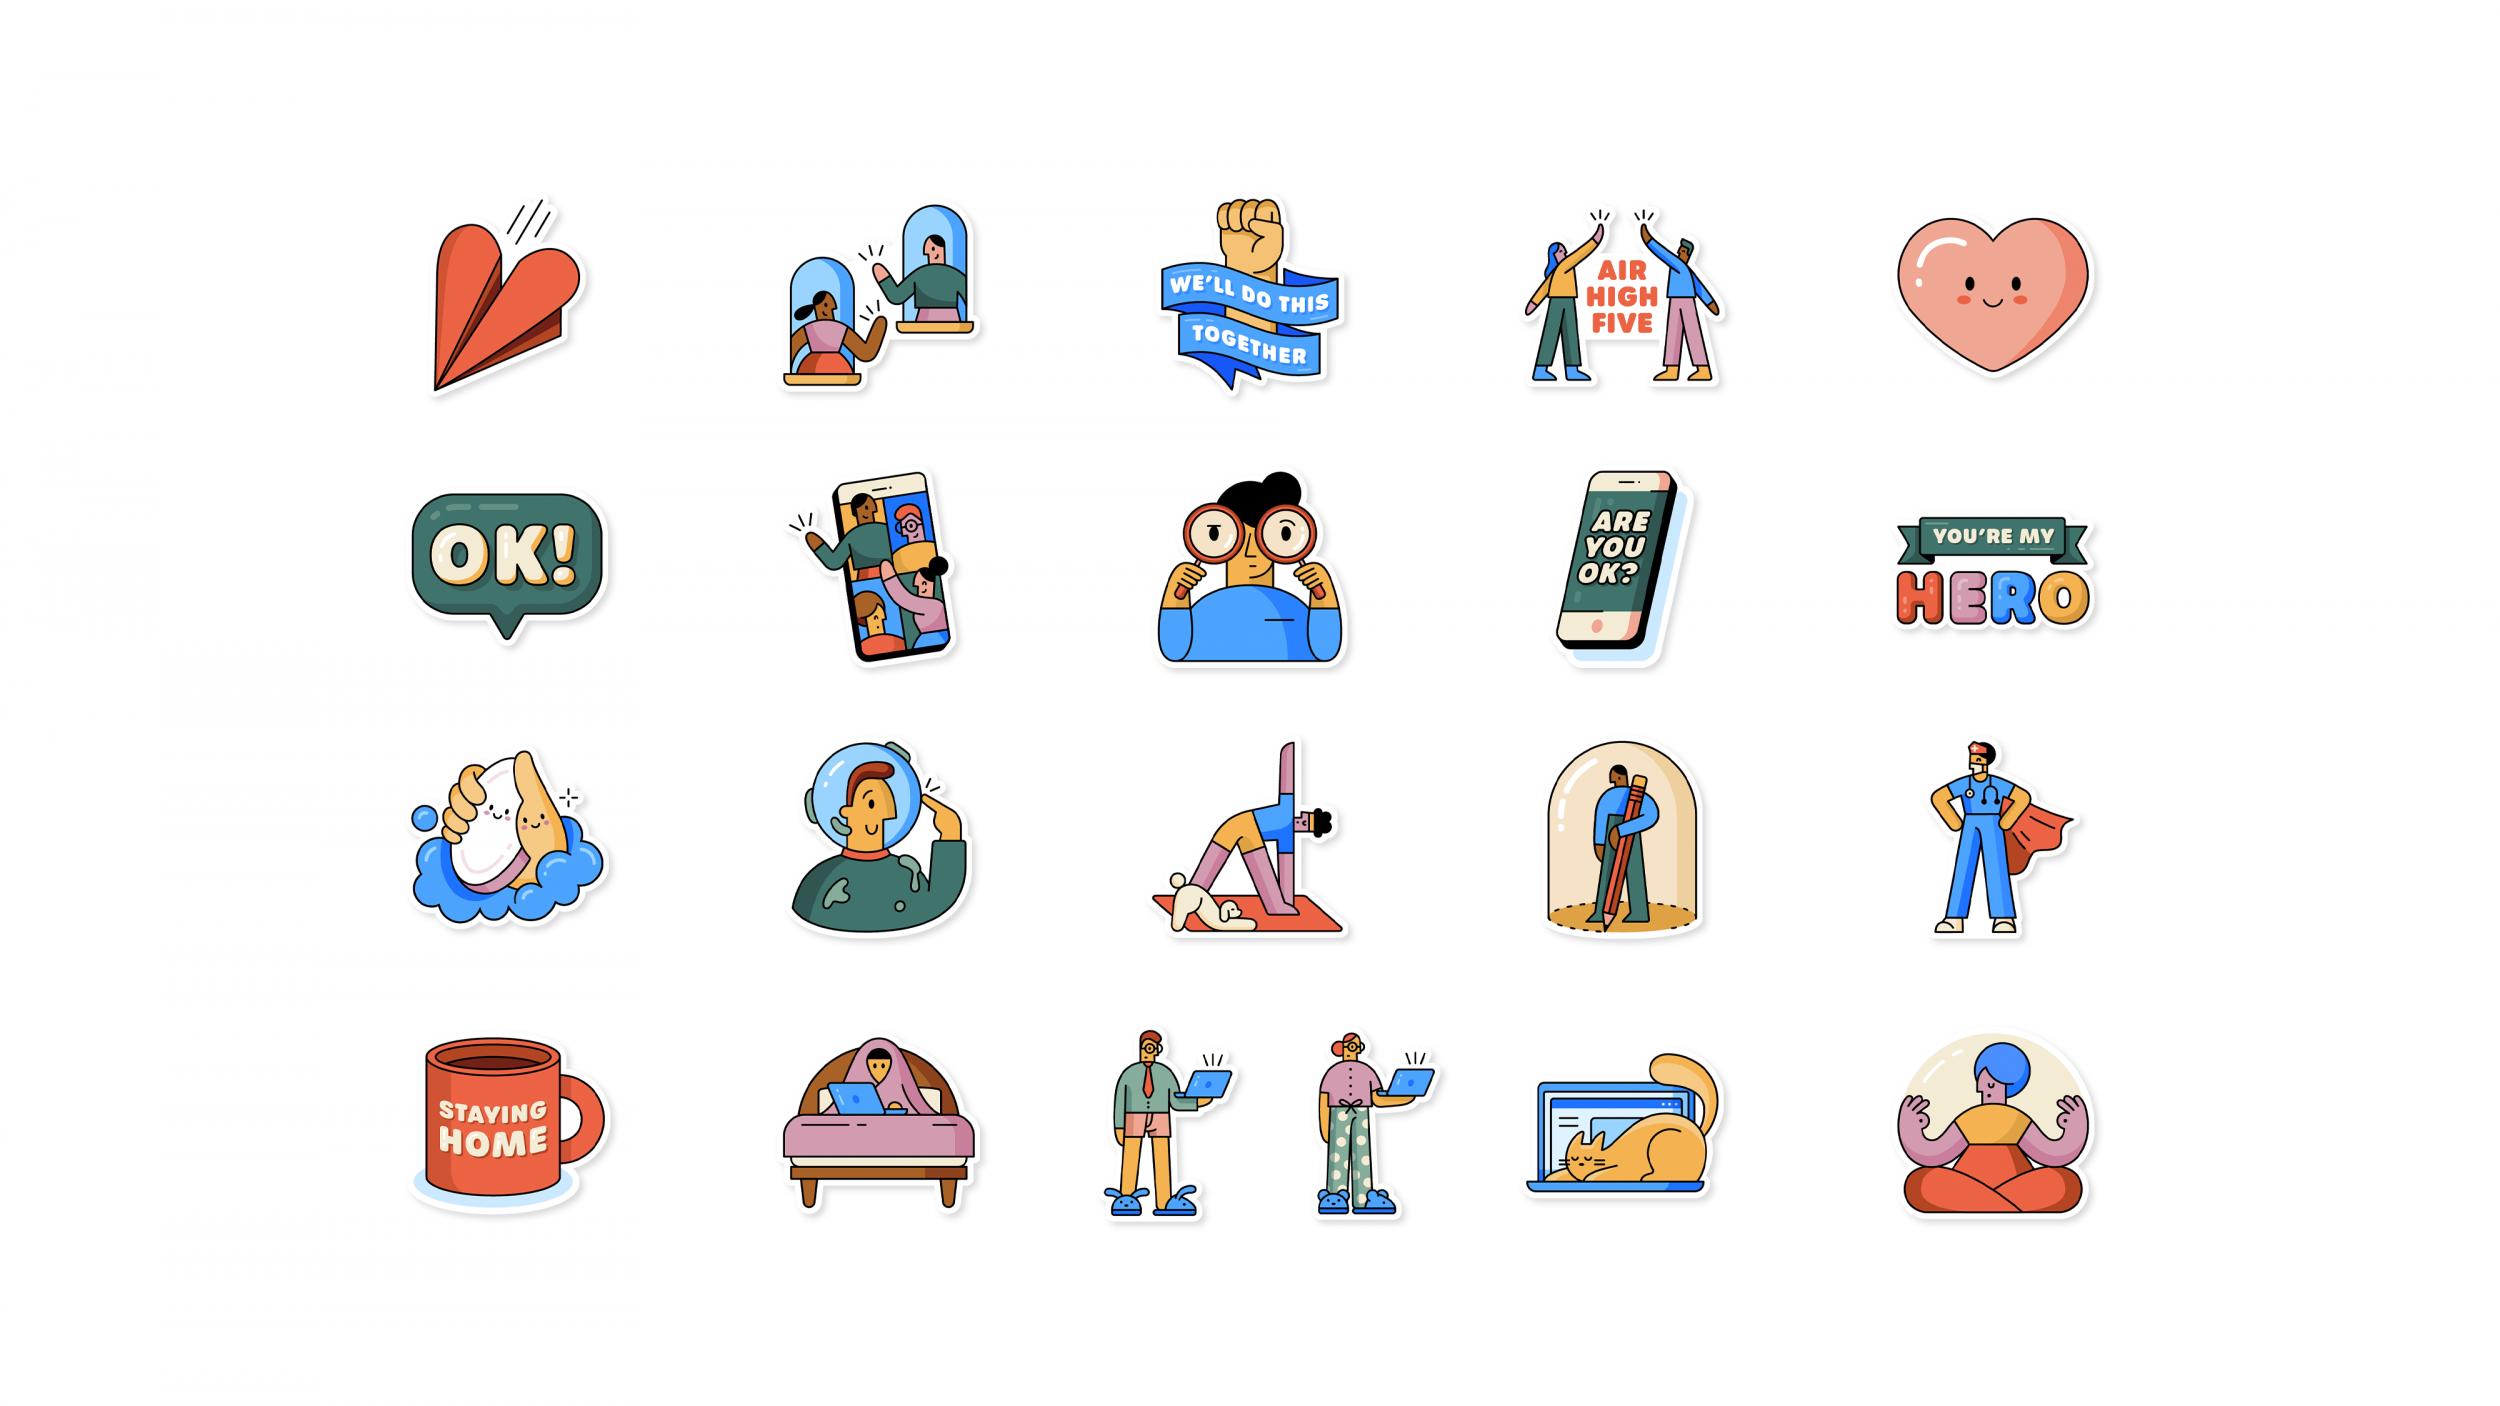 WhatsApp releases new coronavirus-themed stickers to help people ...